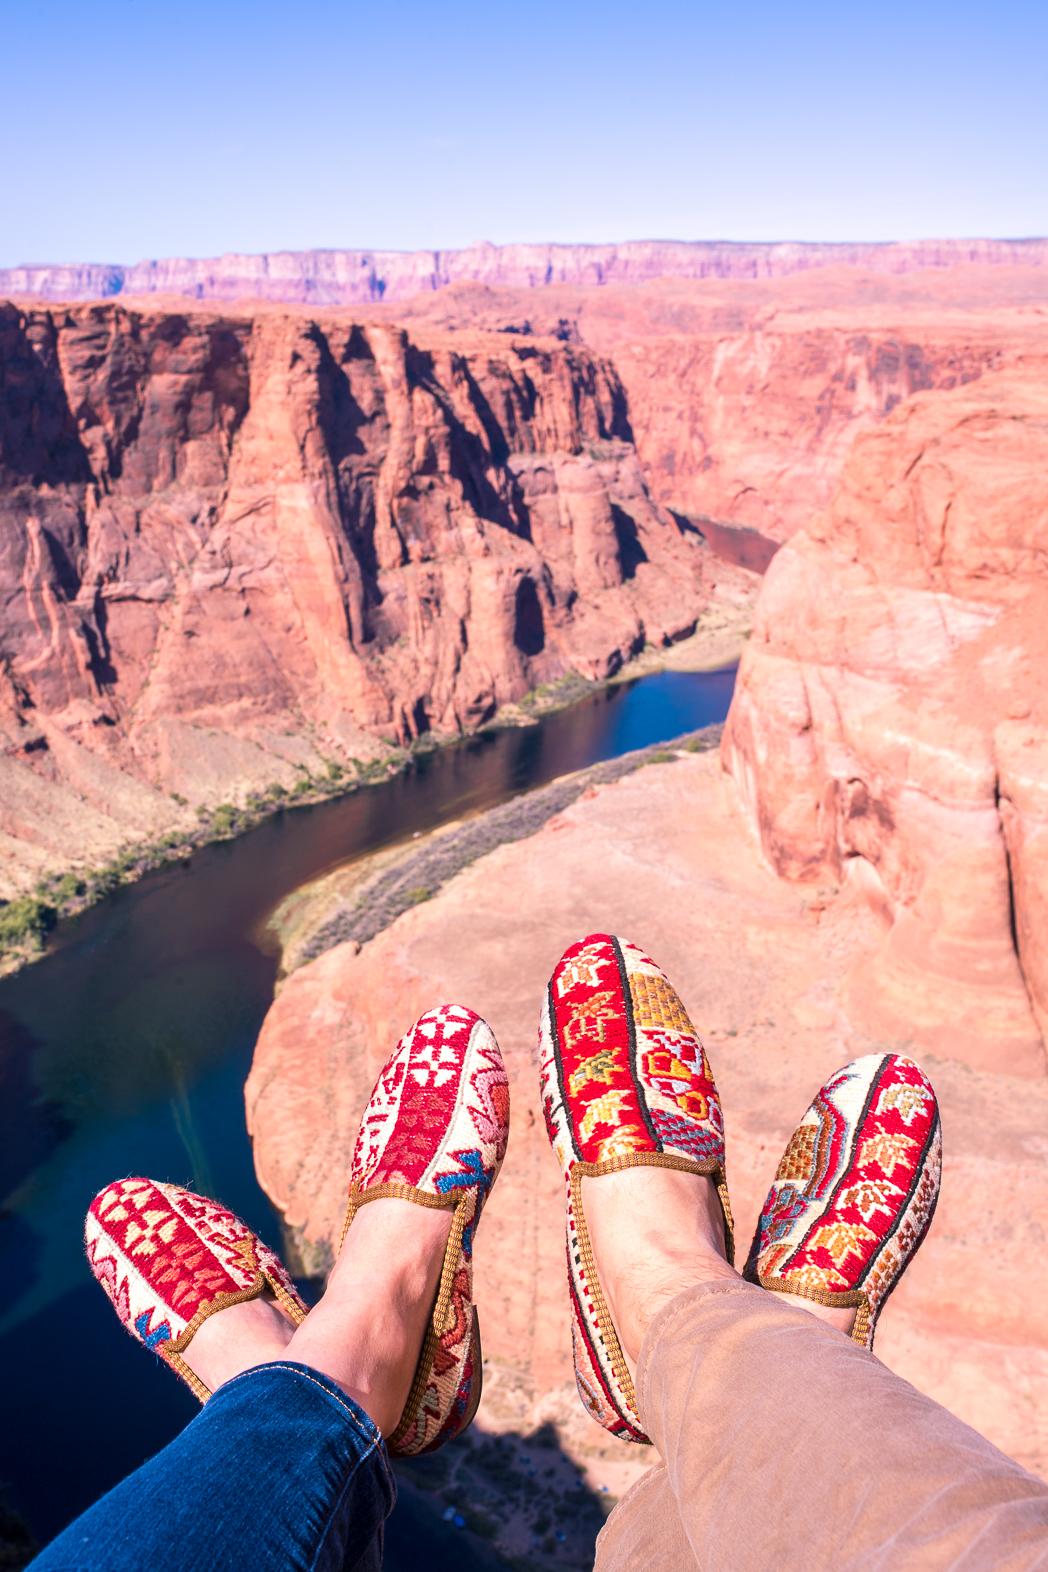 Stacie Flinner Grand Canyon Artemis Design Co-13.jpg